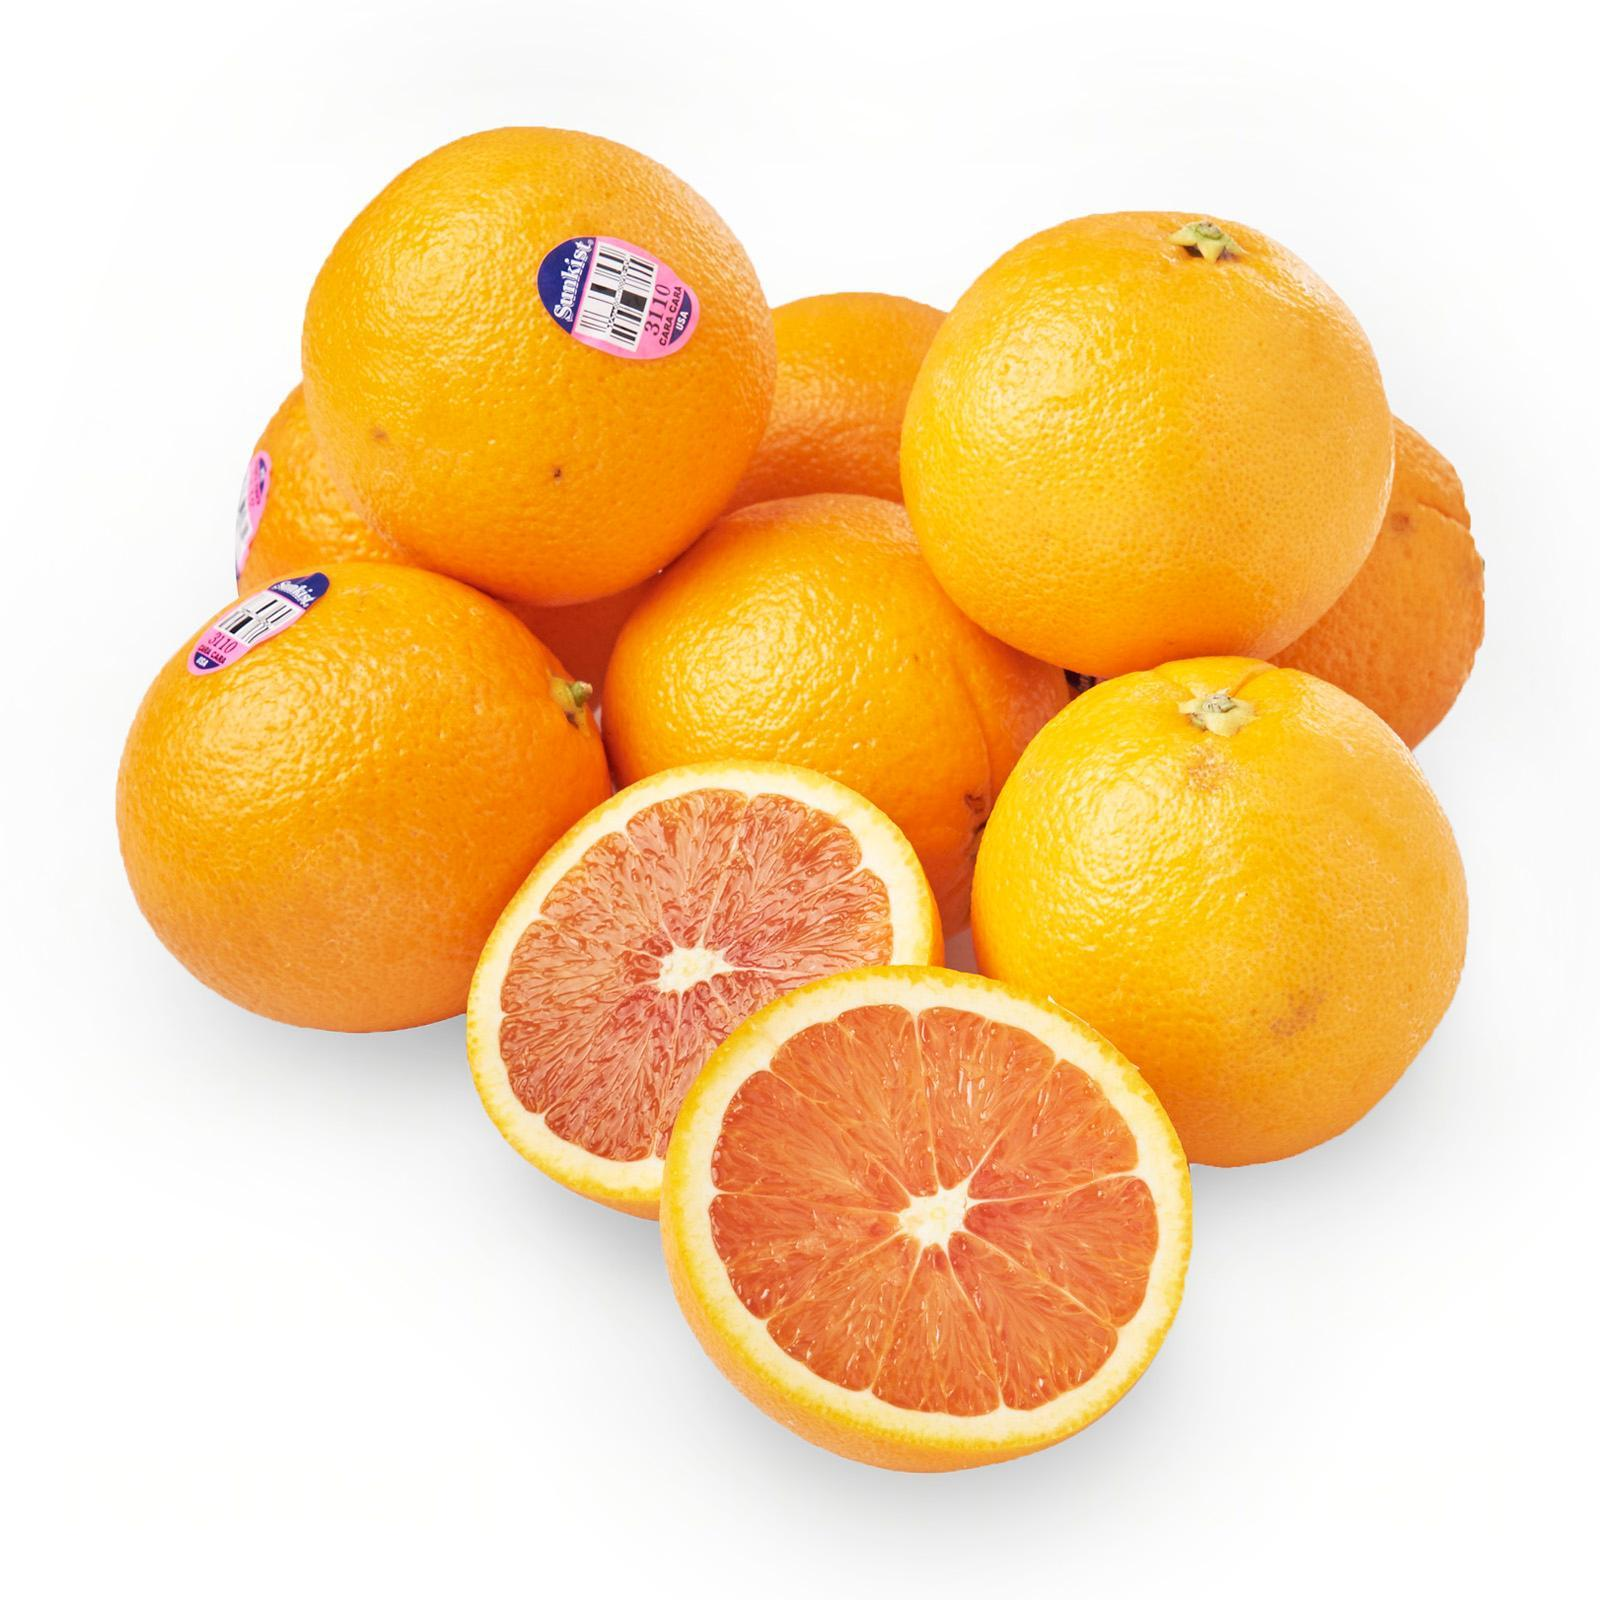 Sunkist Cara Cara Navel Orange